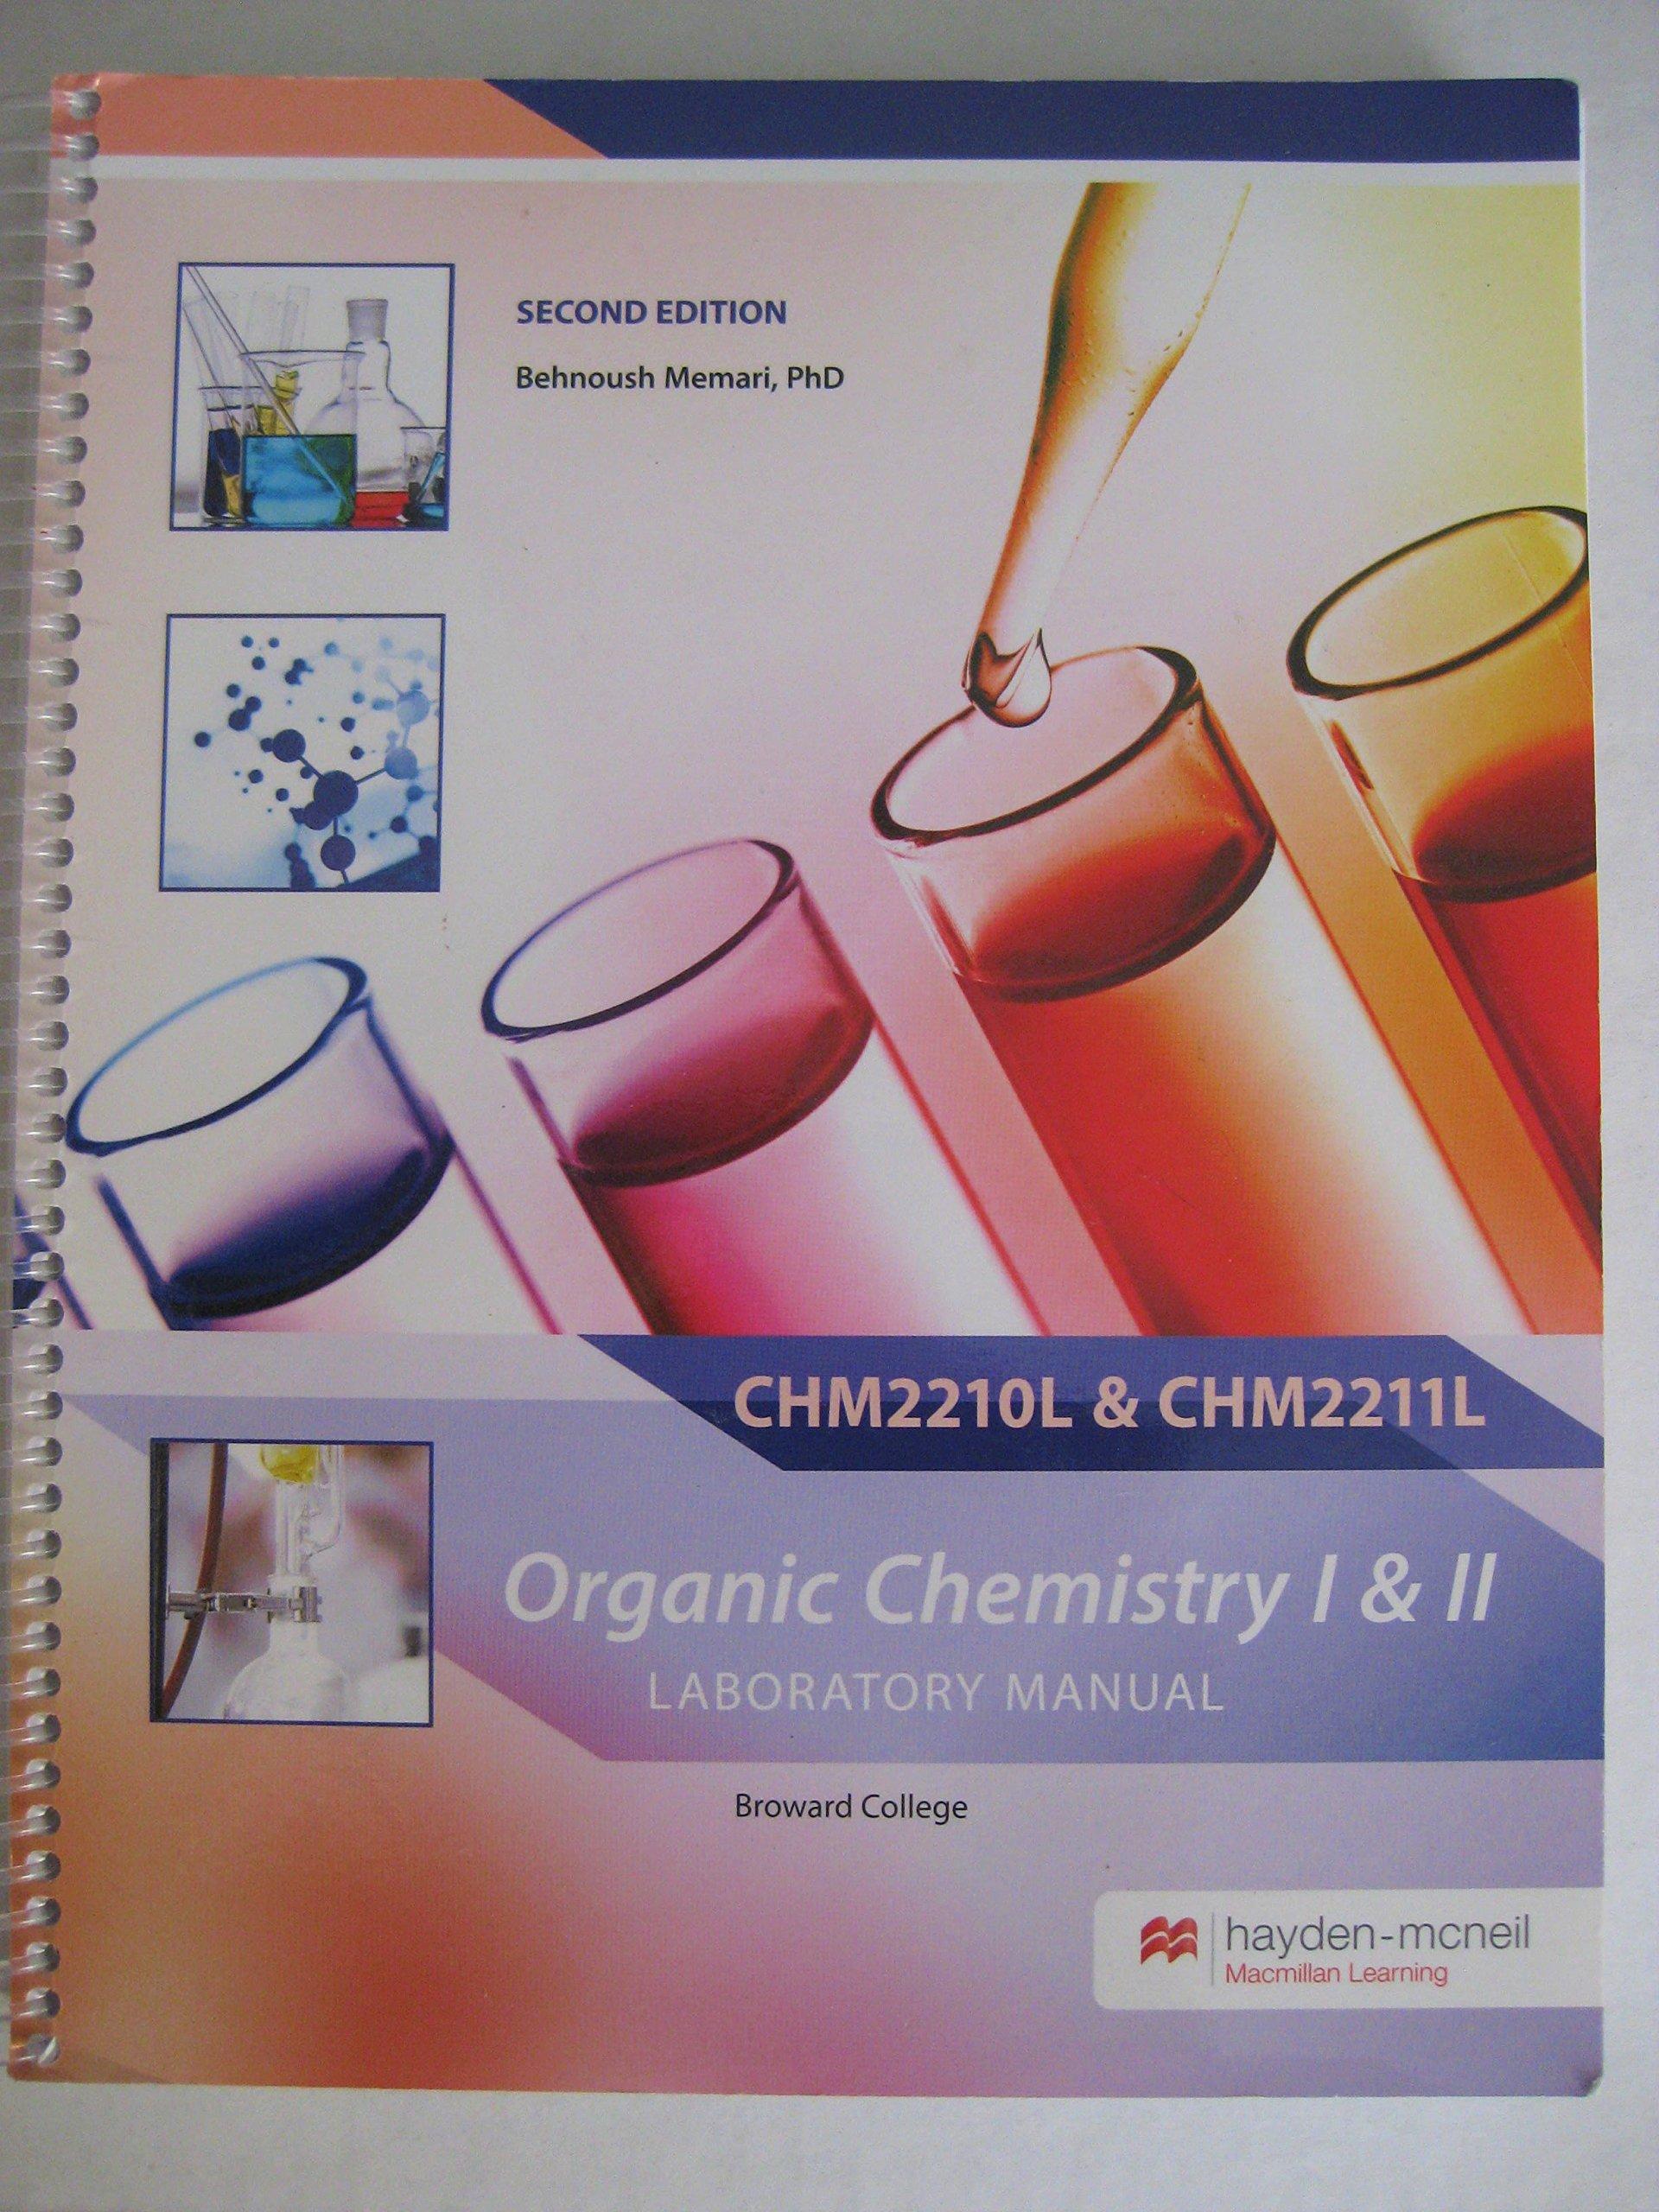 Organic Chemistry I & II Laboratory Manual: Behnoush Memari: 9780738088624:  Amazon.com: Books